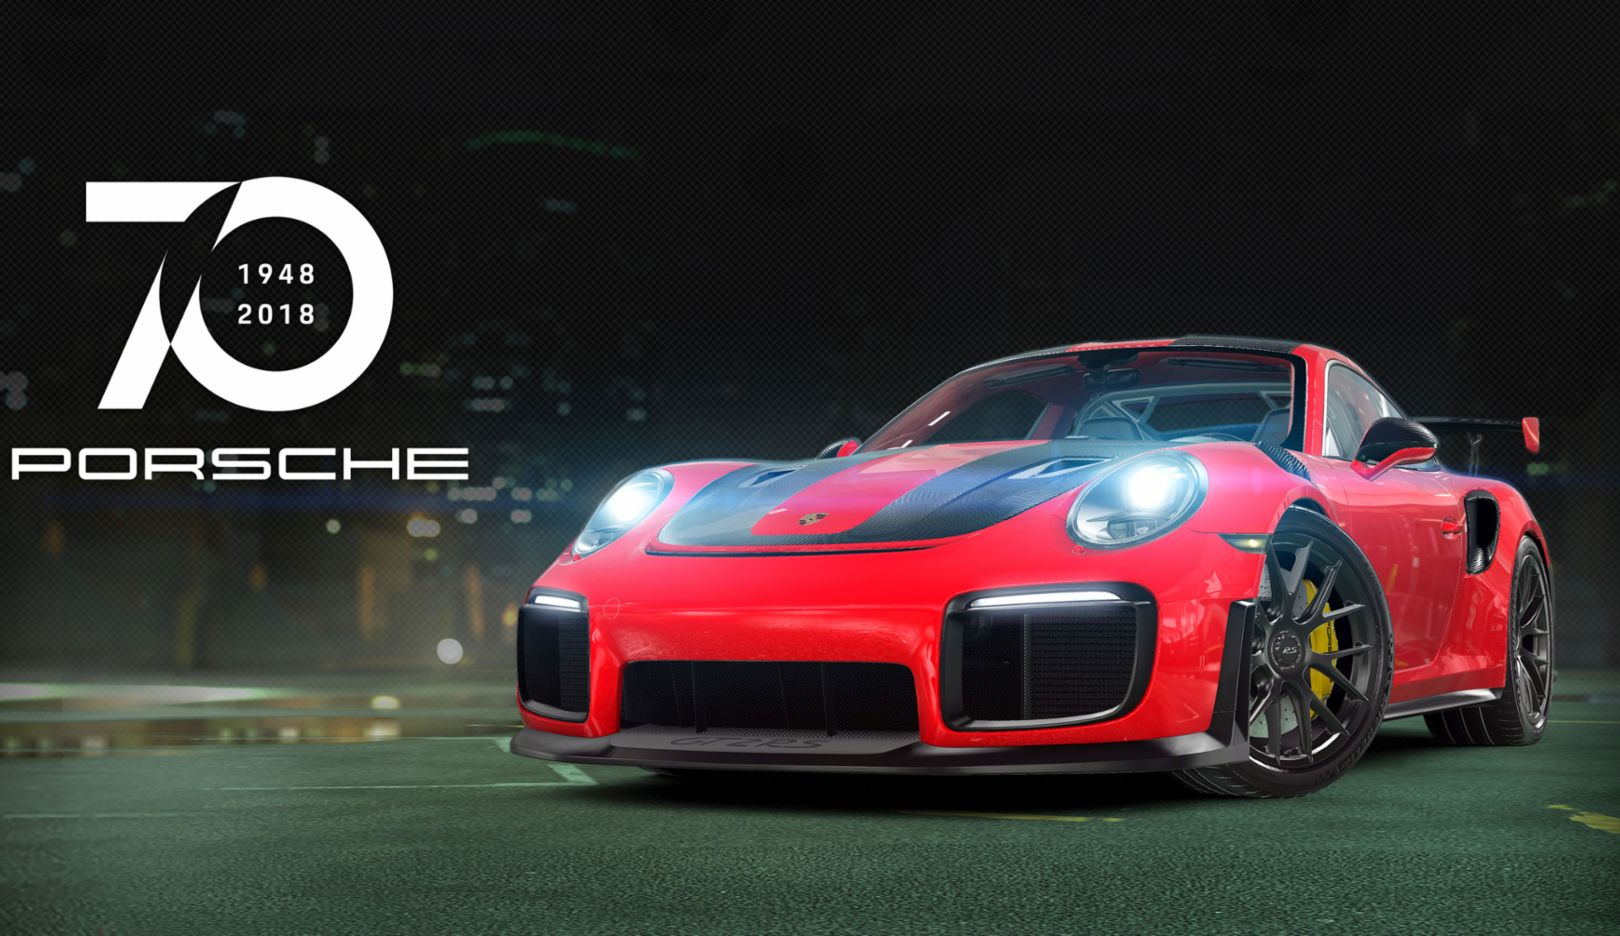 911 GT2 RS, Mobiles Rennspiel CSR Racing 2, 2018, Porsche AG